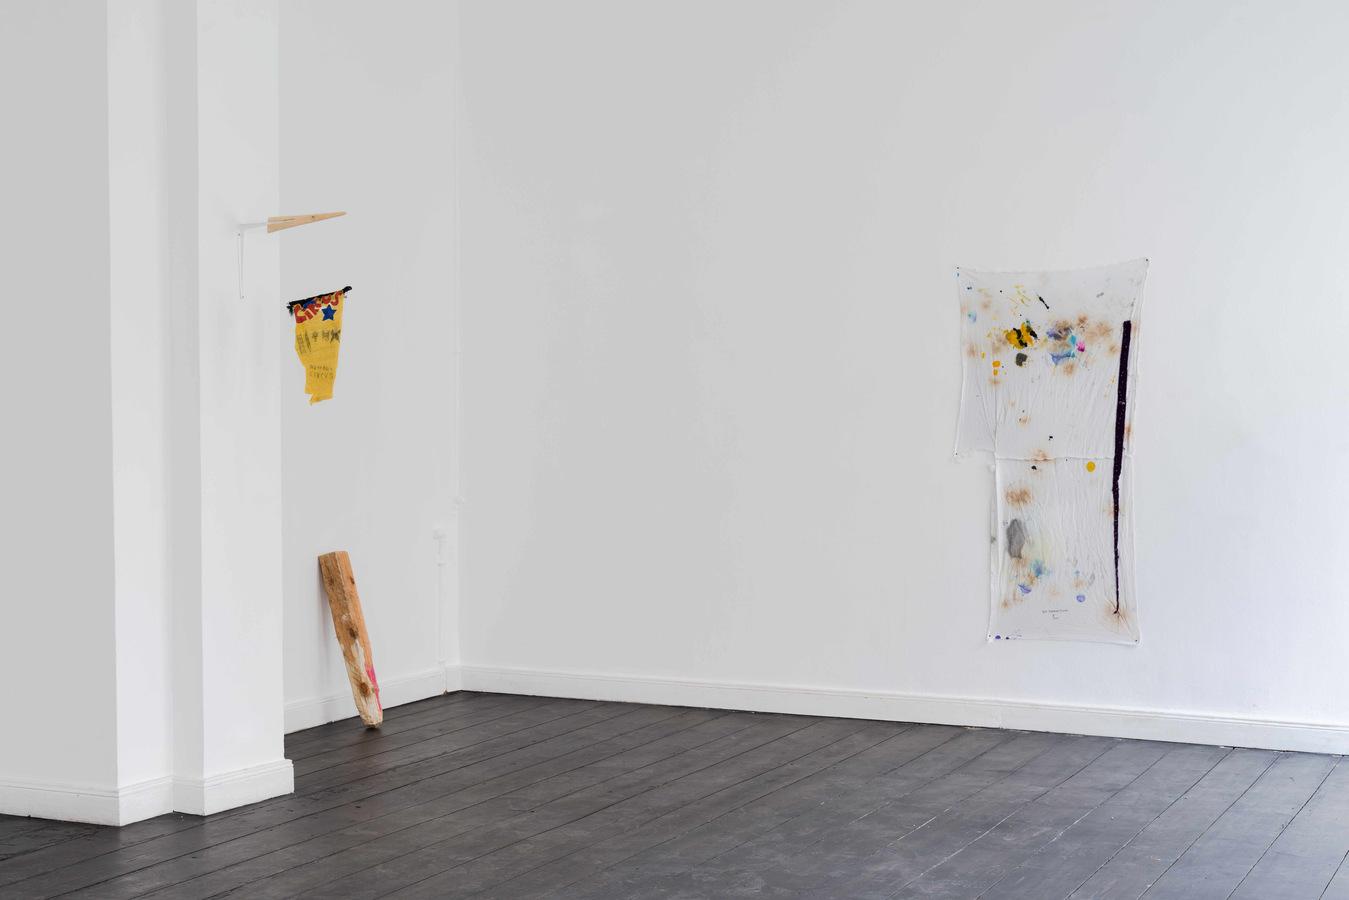 TGood RETO PULFER artdoc Grimmuseum 05 12 2014 _0338-Edit